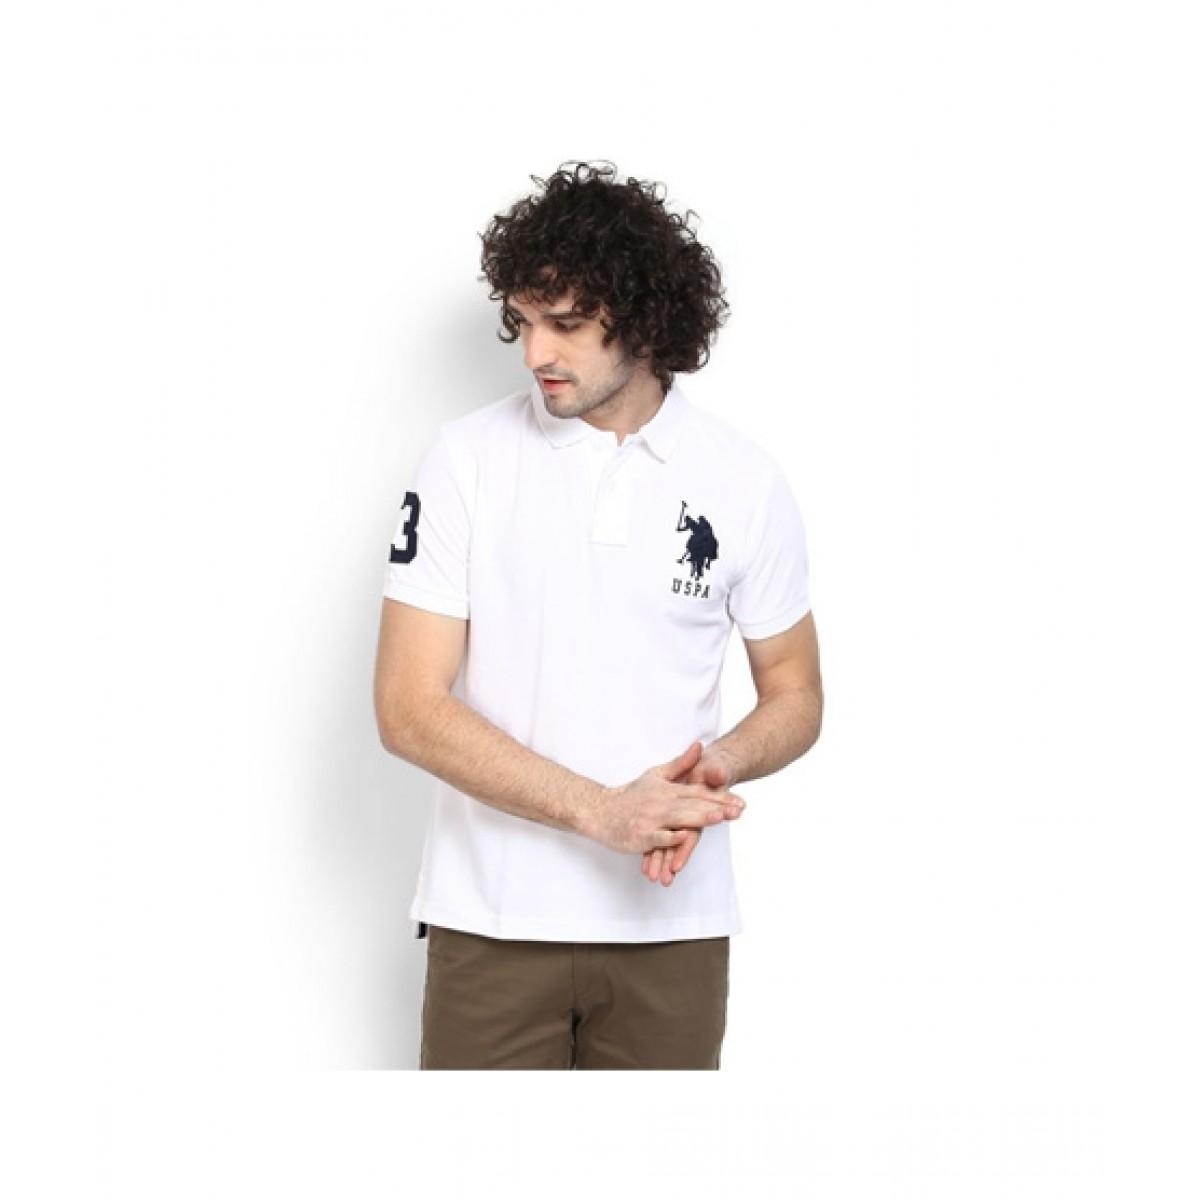 U S Polo Assn Shirt For Men White Price In Pakistan Buy U S Polo